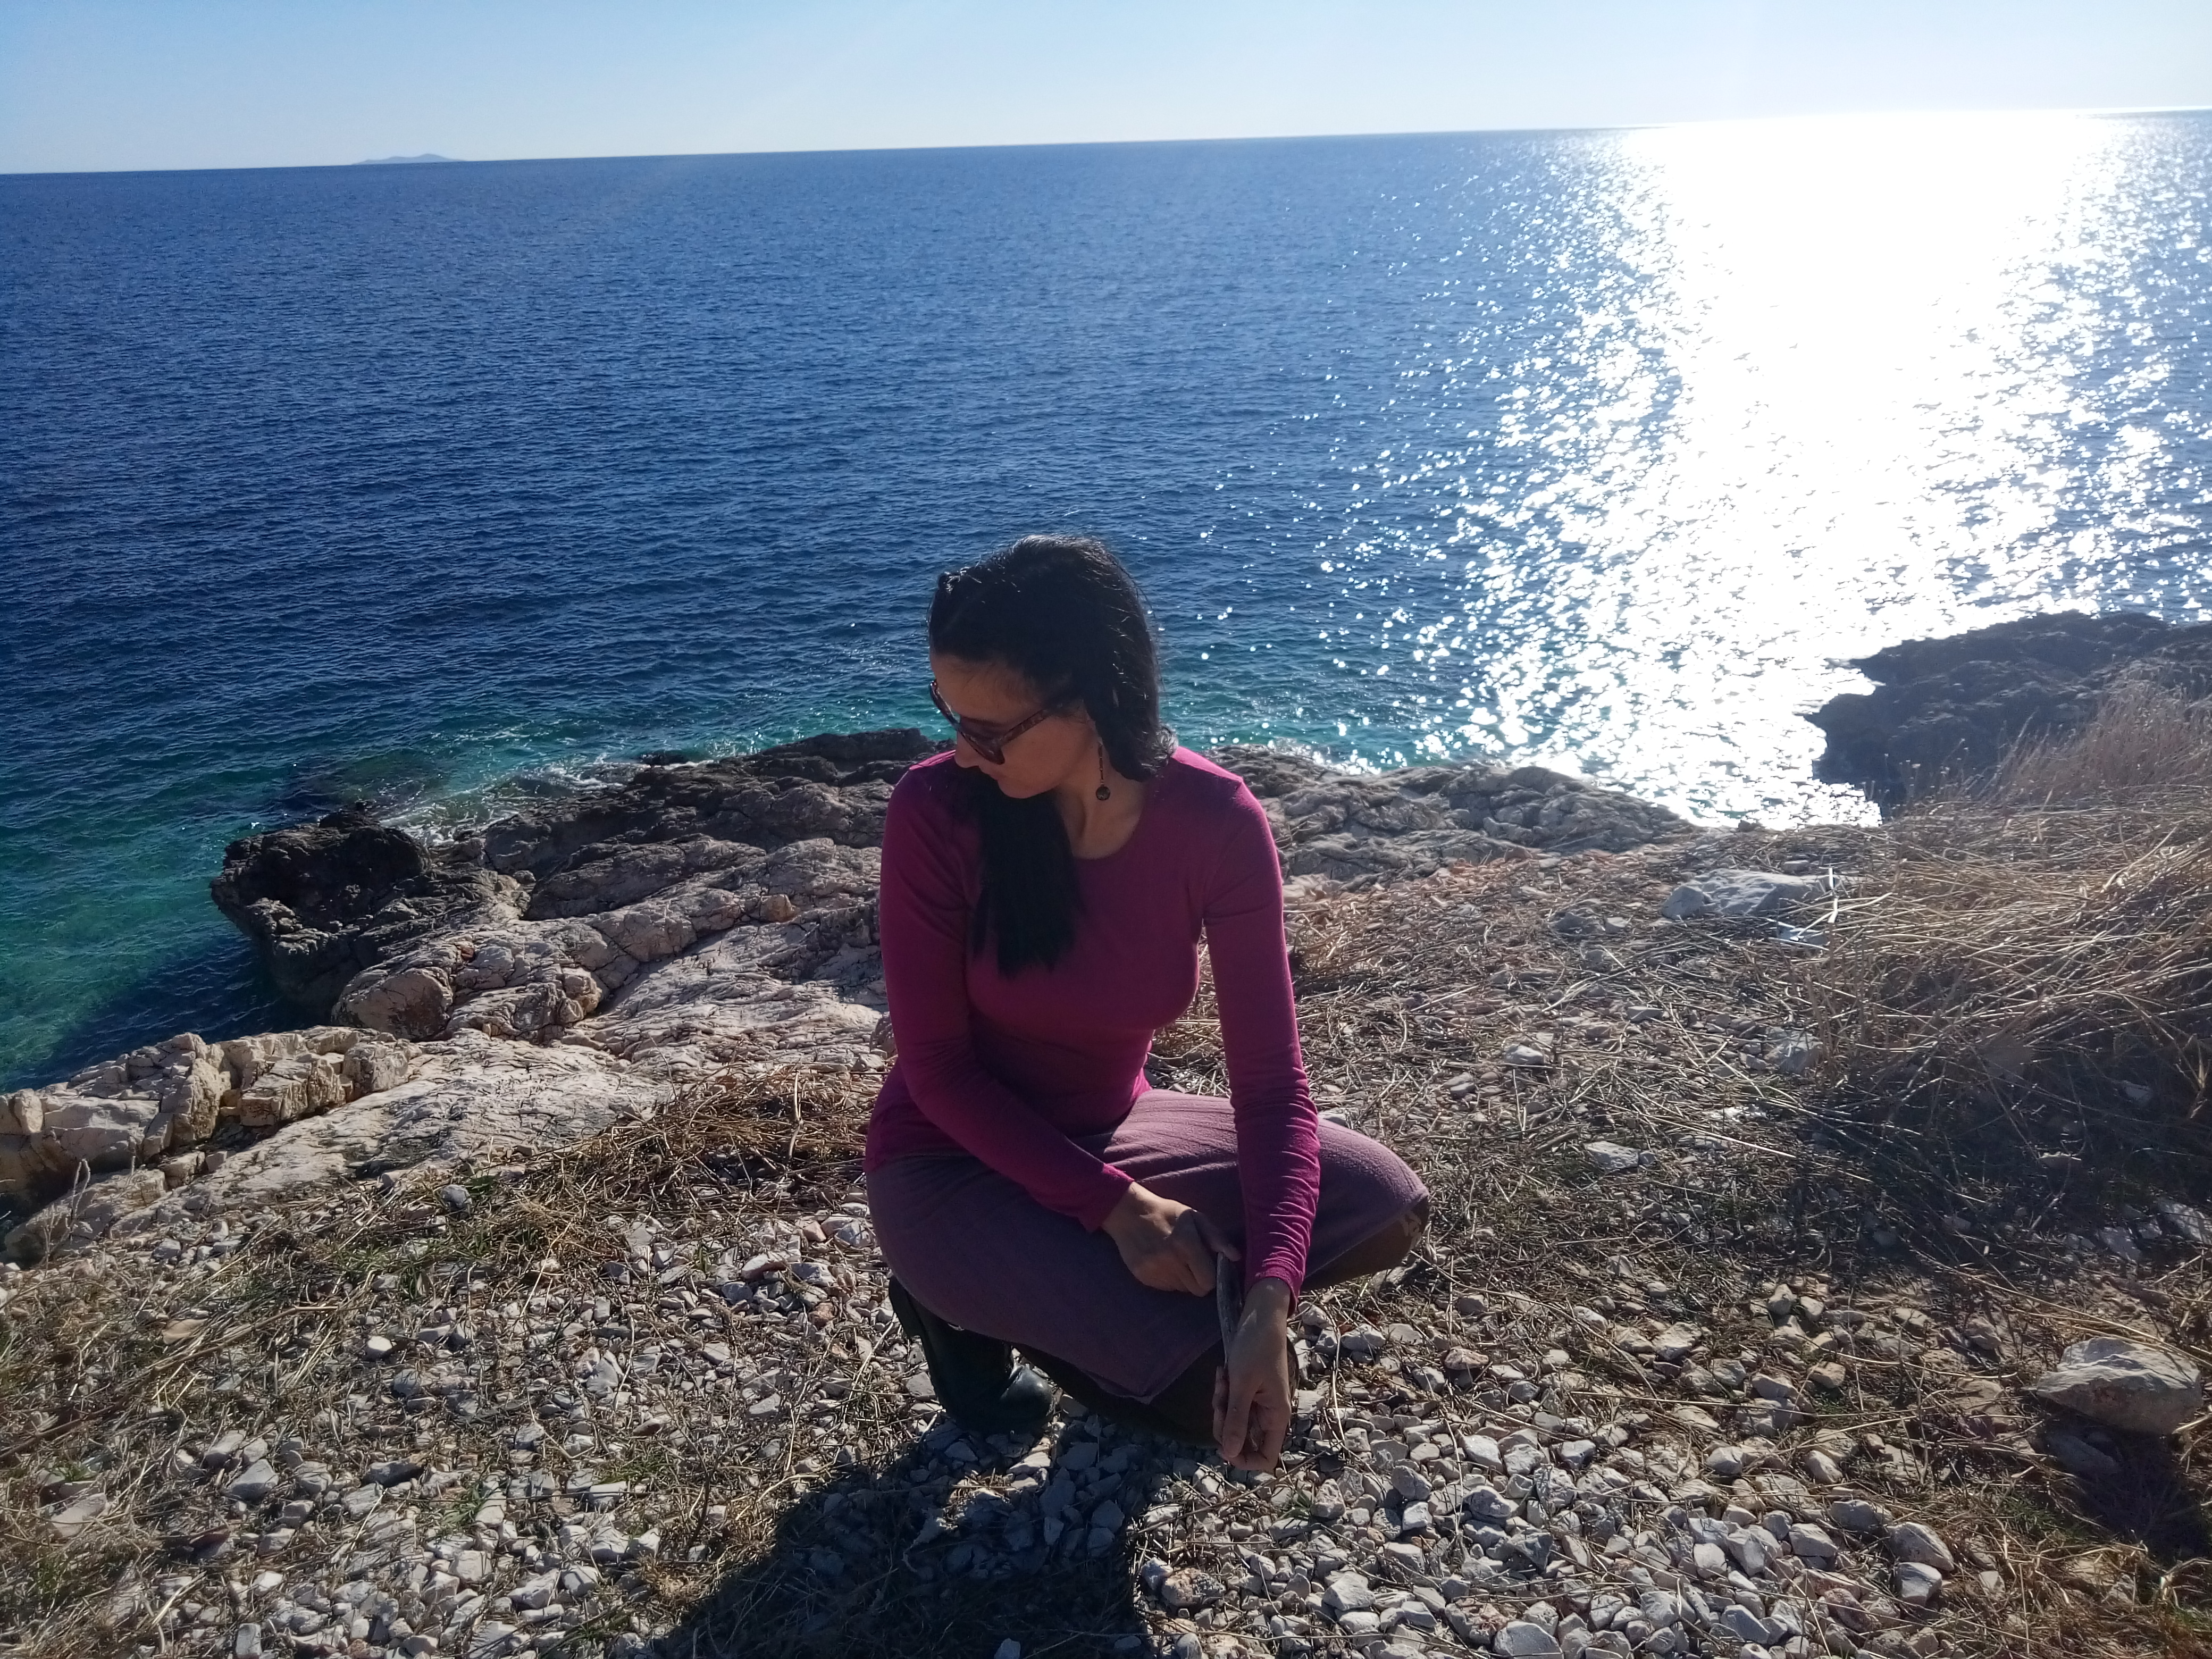 #milna #milnabay #modaodaradosti #travel #croatia